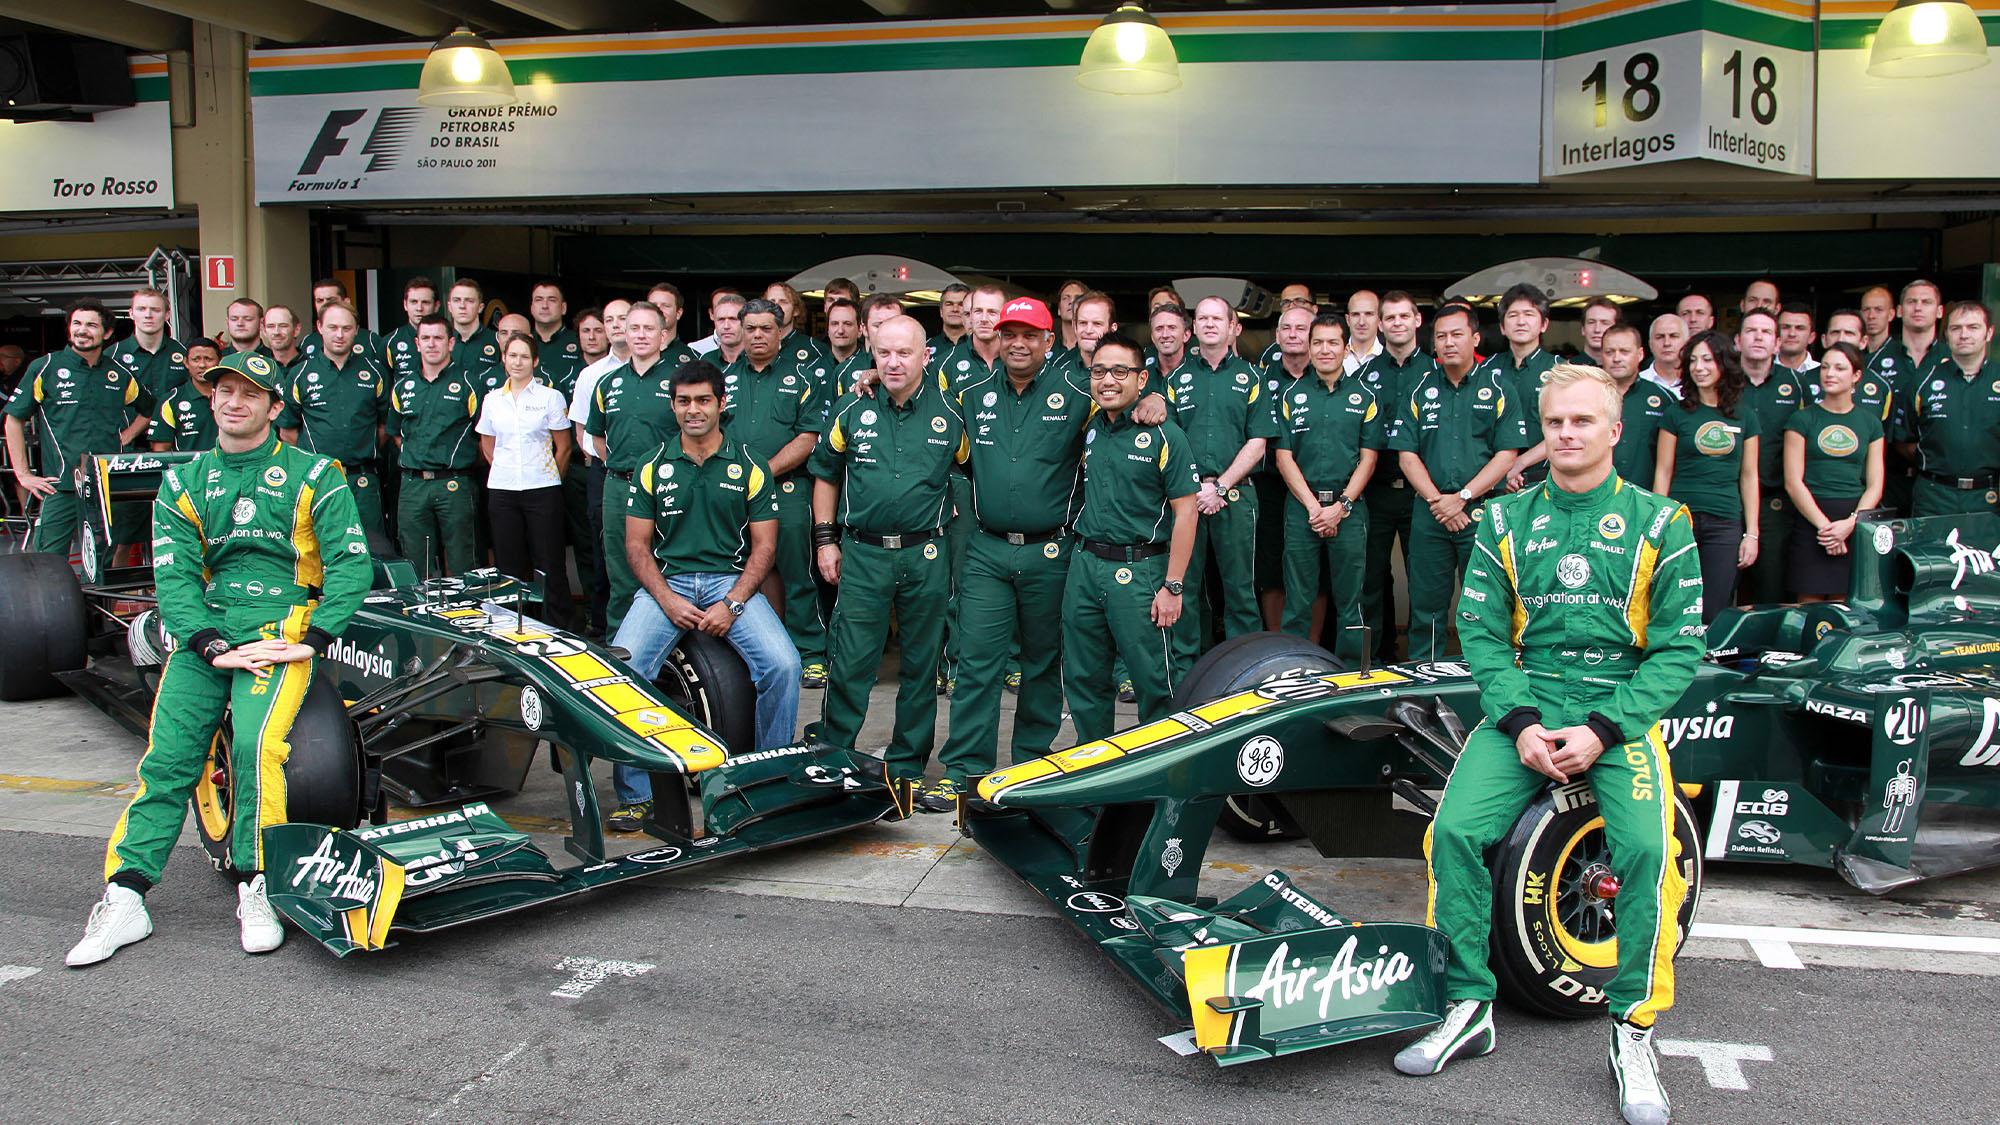 Lotus team photo